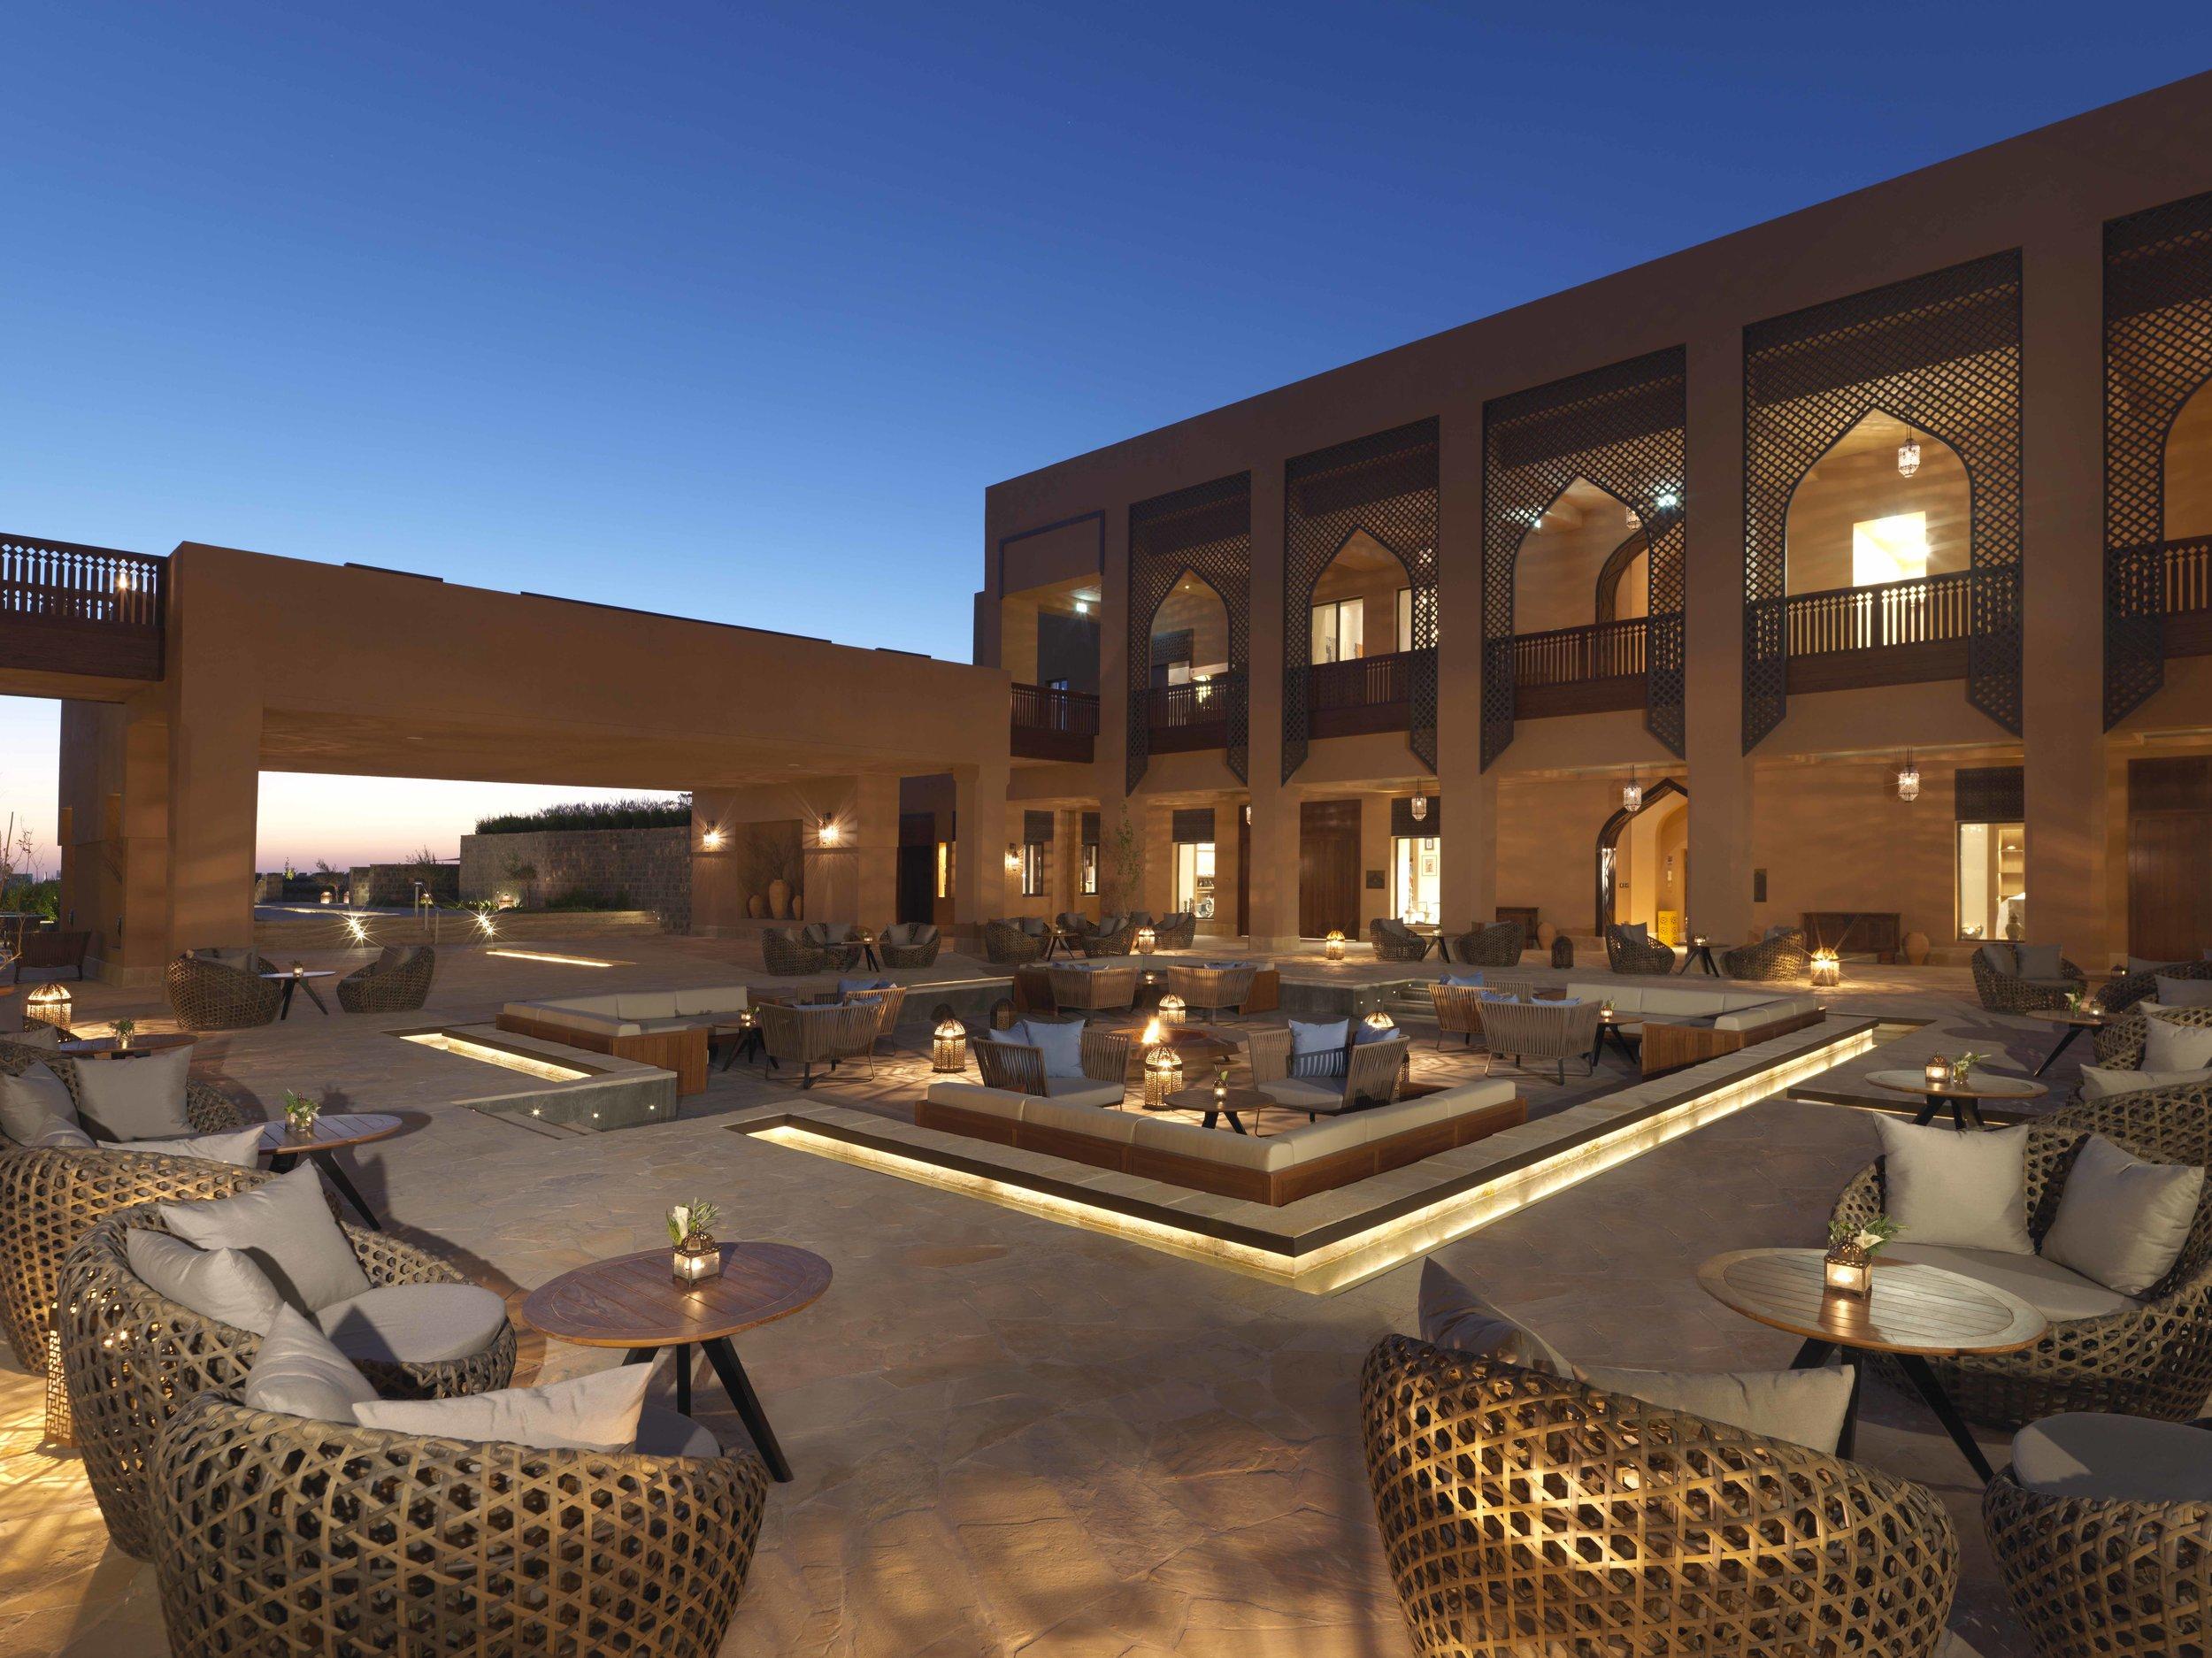 Anantara Al Jabal Al Akhdar Resort - Courtyard.jpg